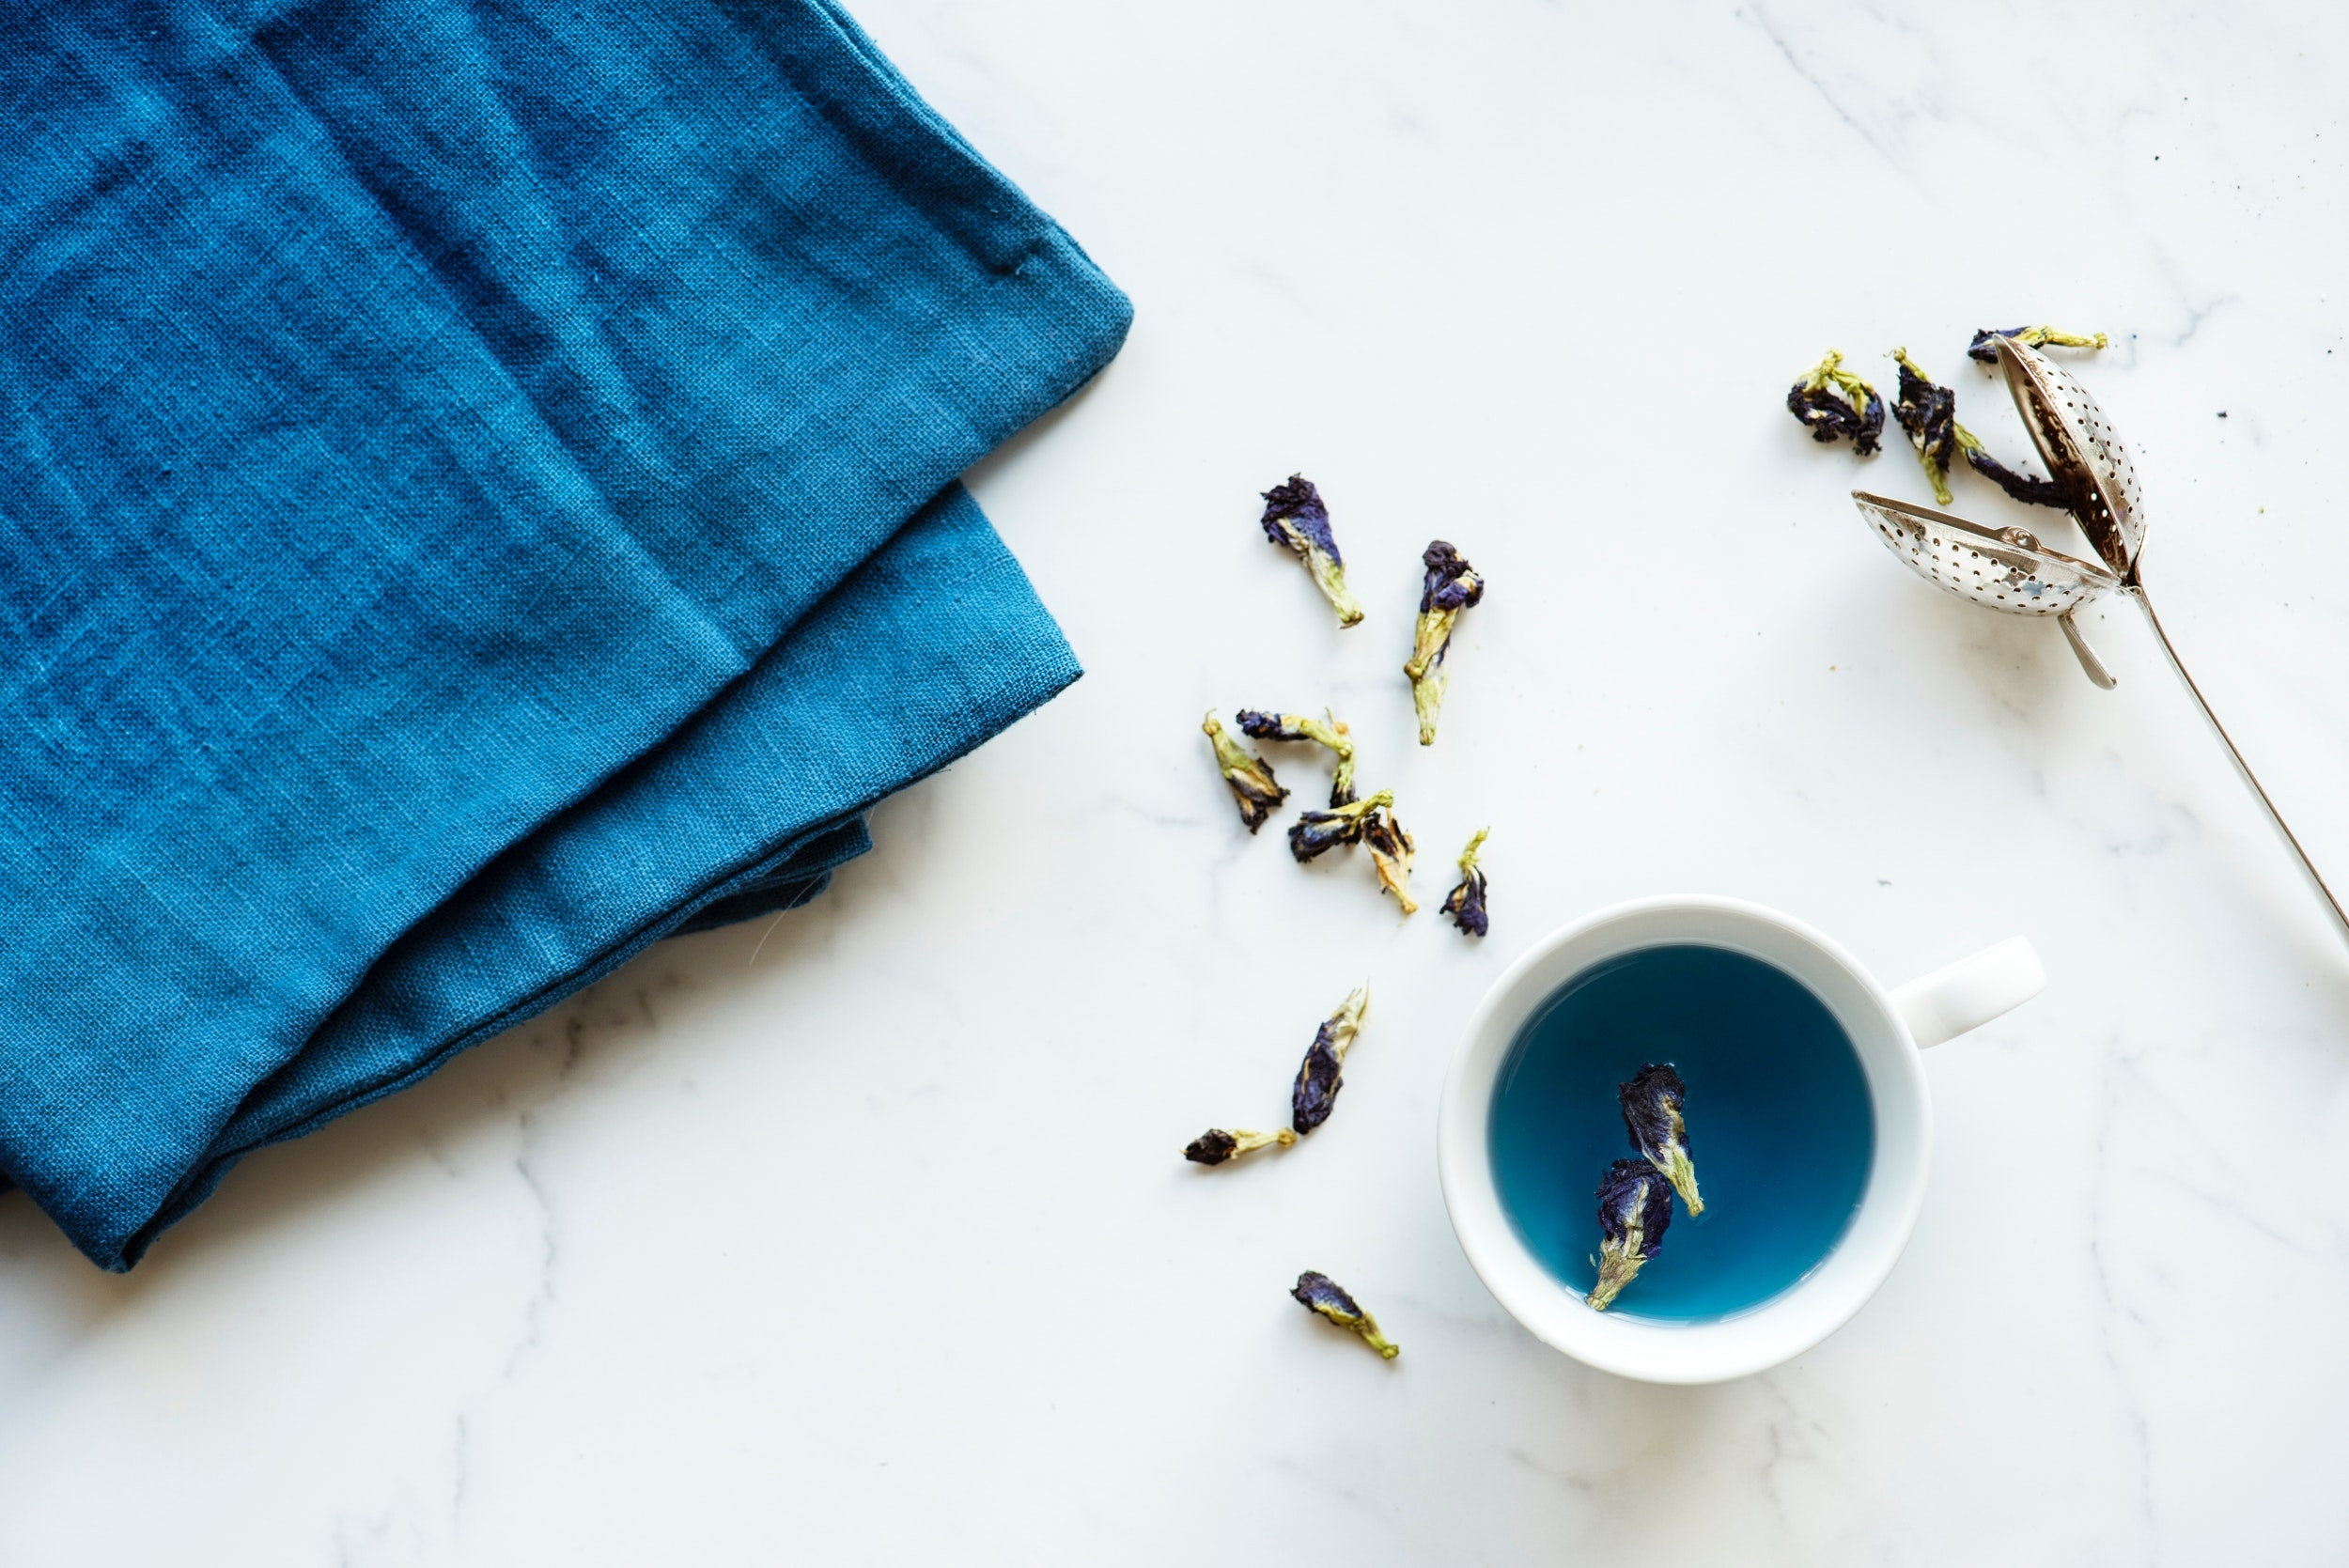 beverage-blue-cup-920120